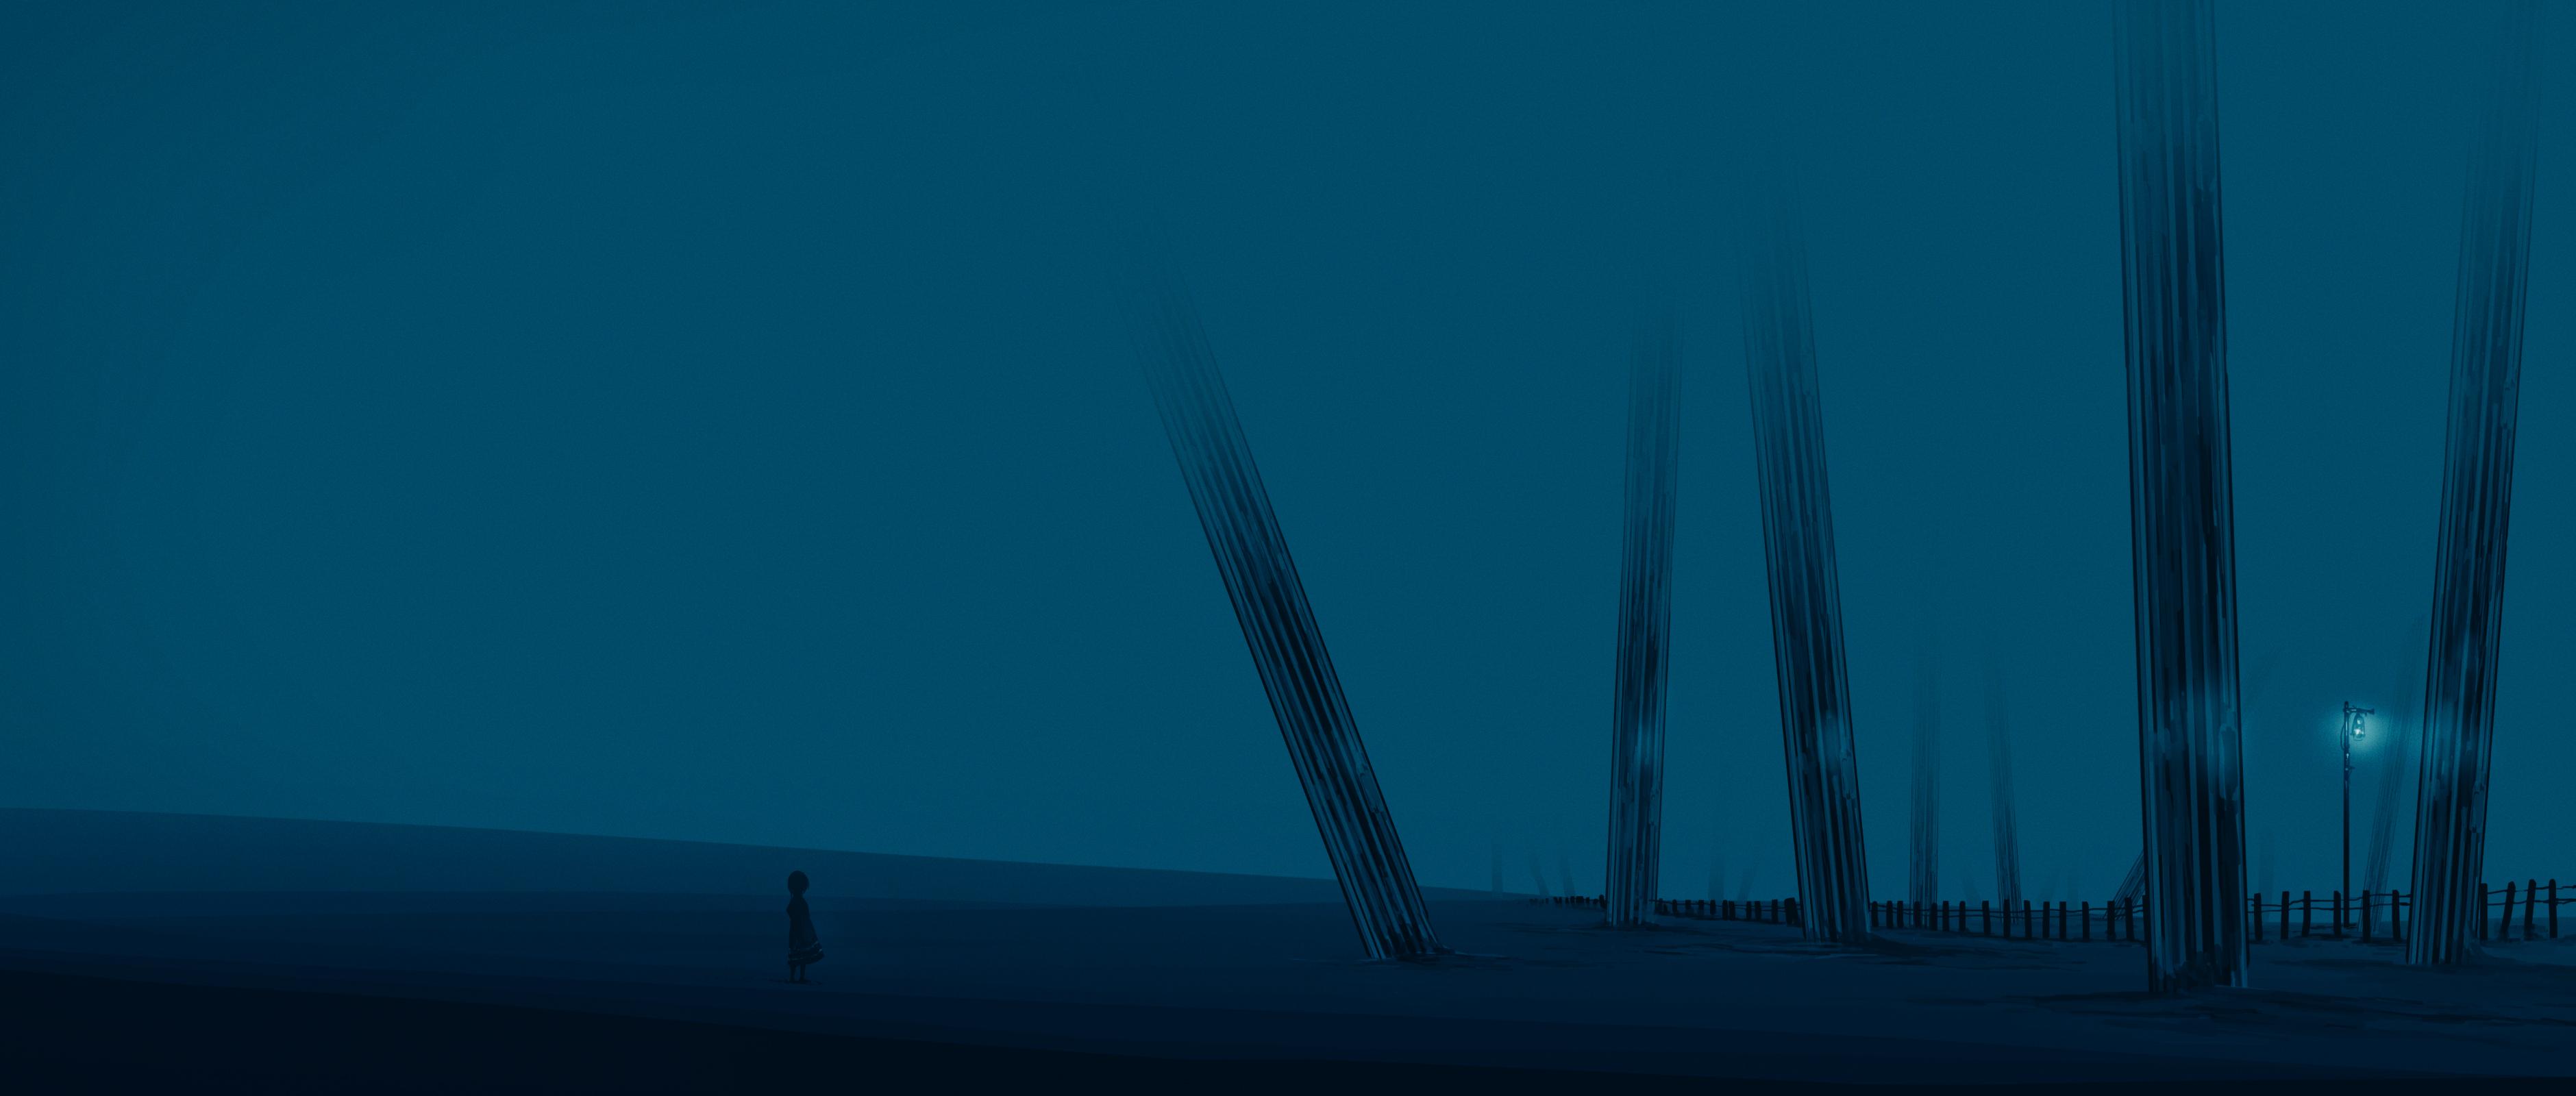 【P站画师】静谧风景壁纸,日本画师住崎的插画作品- DILIDM.COM